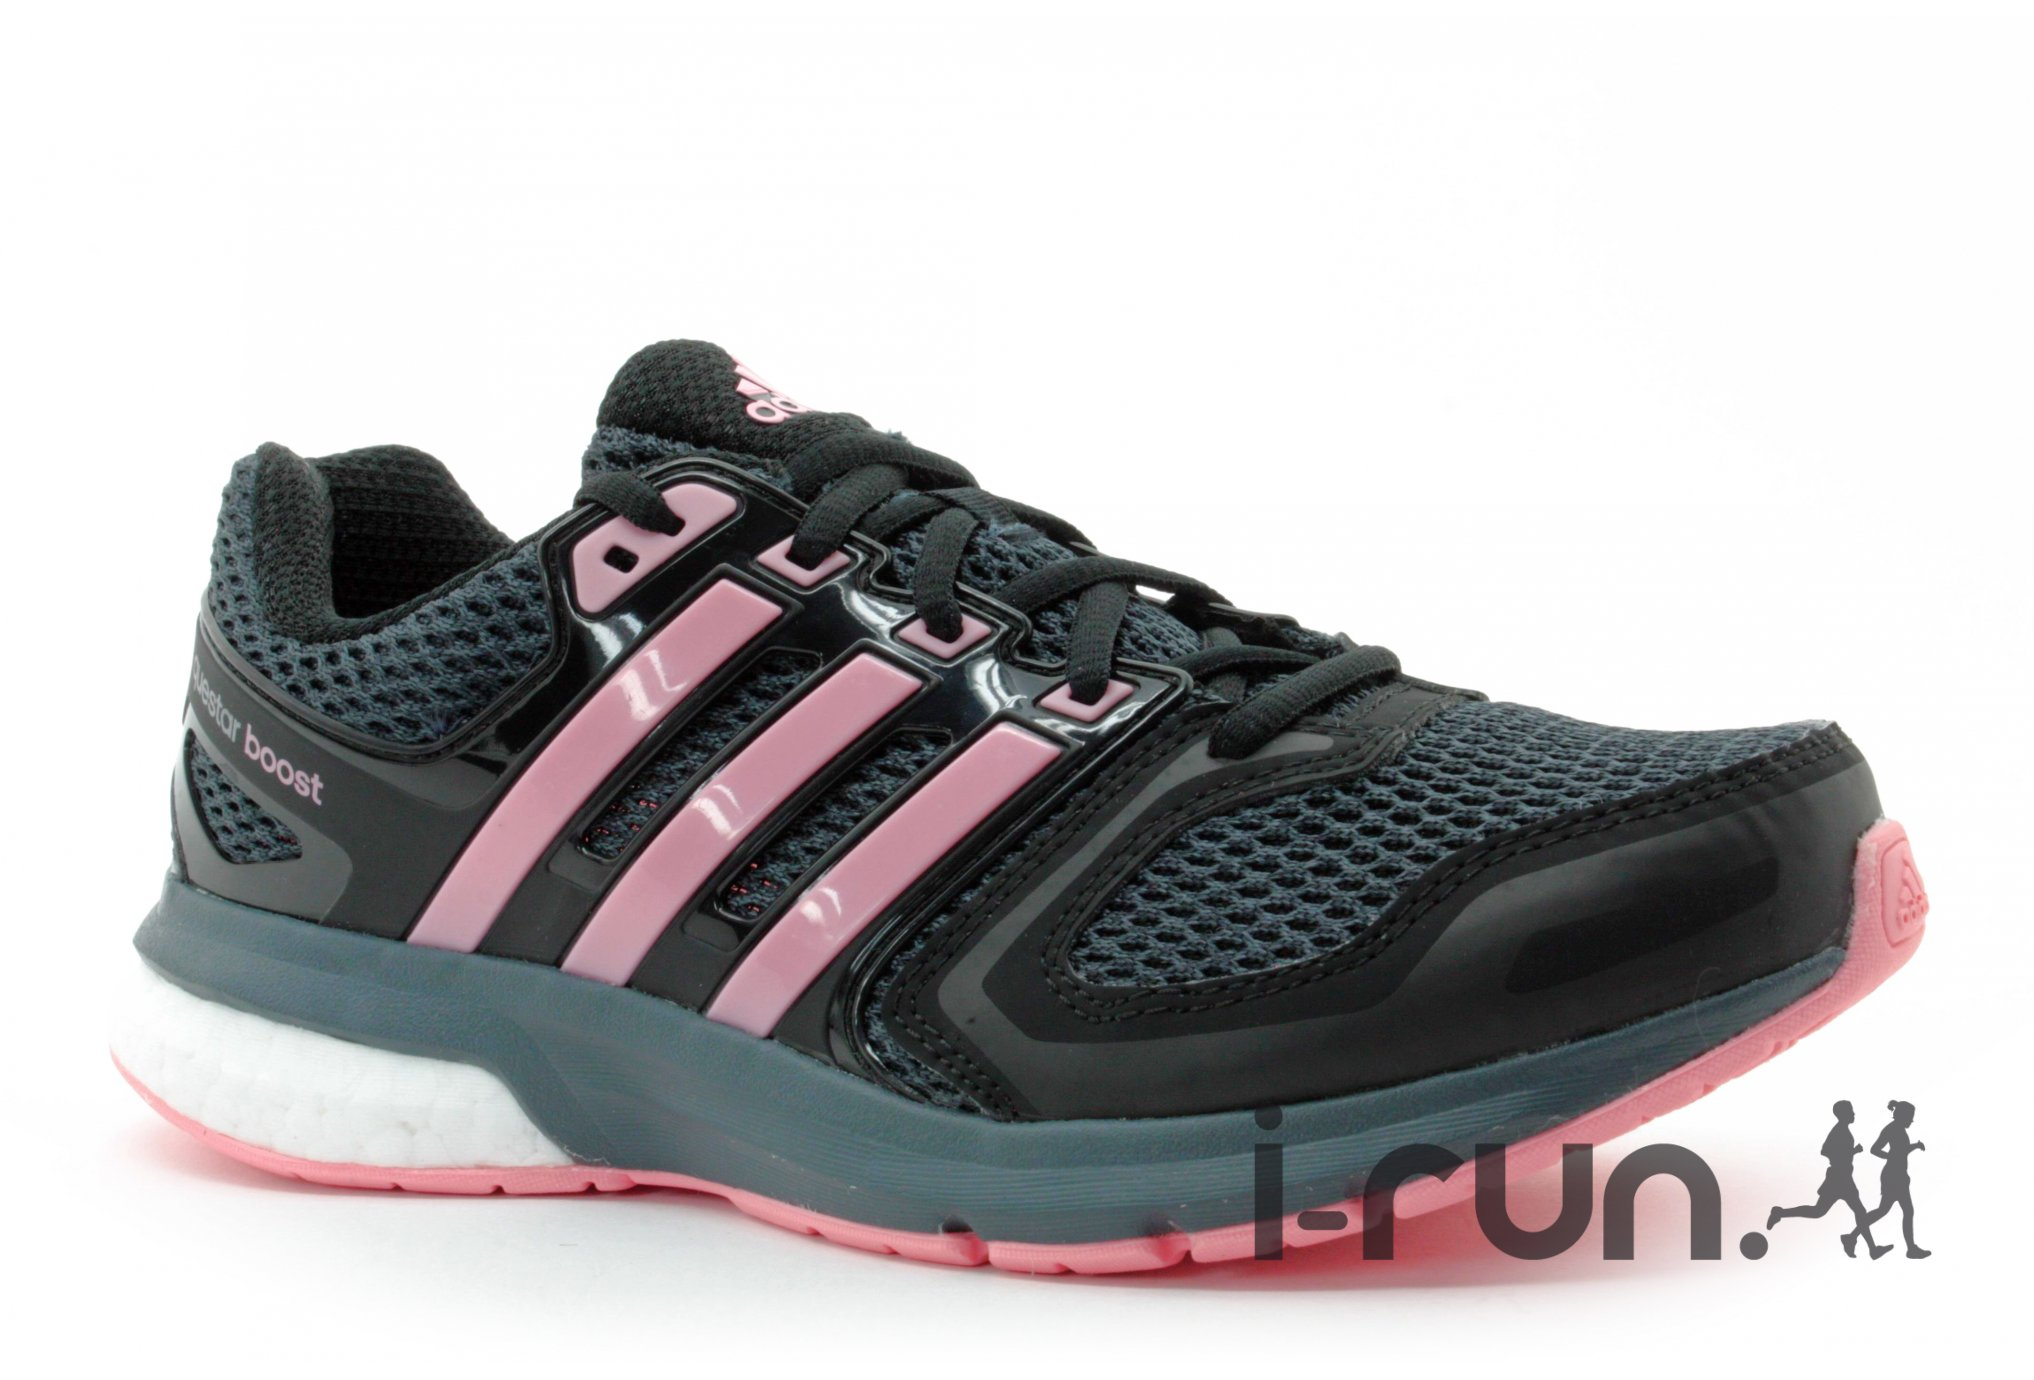 Adidas Questar boost w diététique chaussures femme